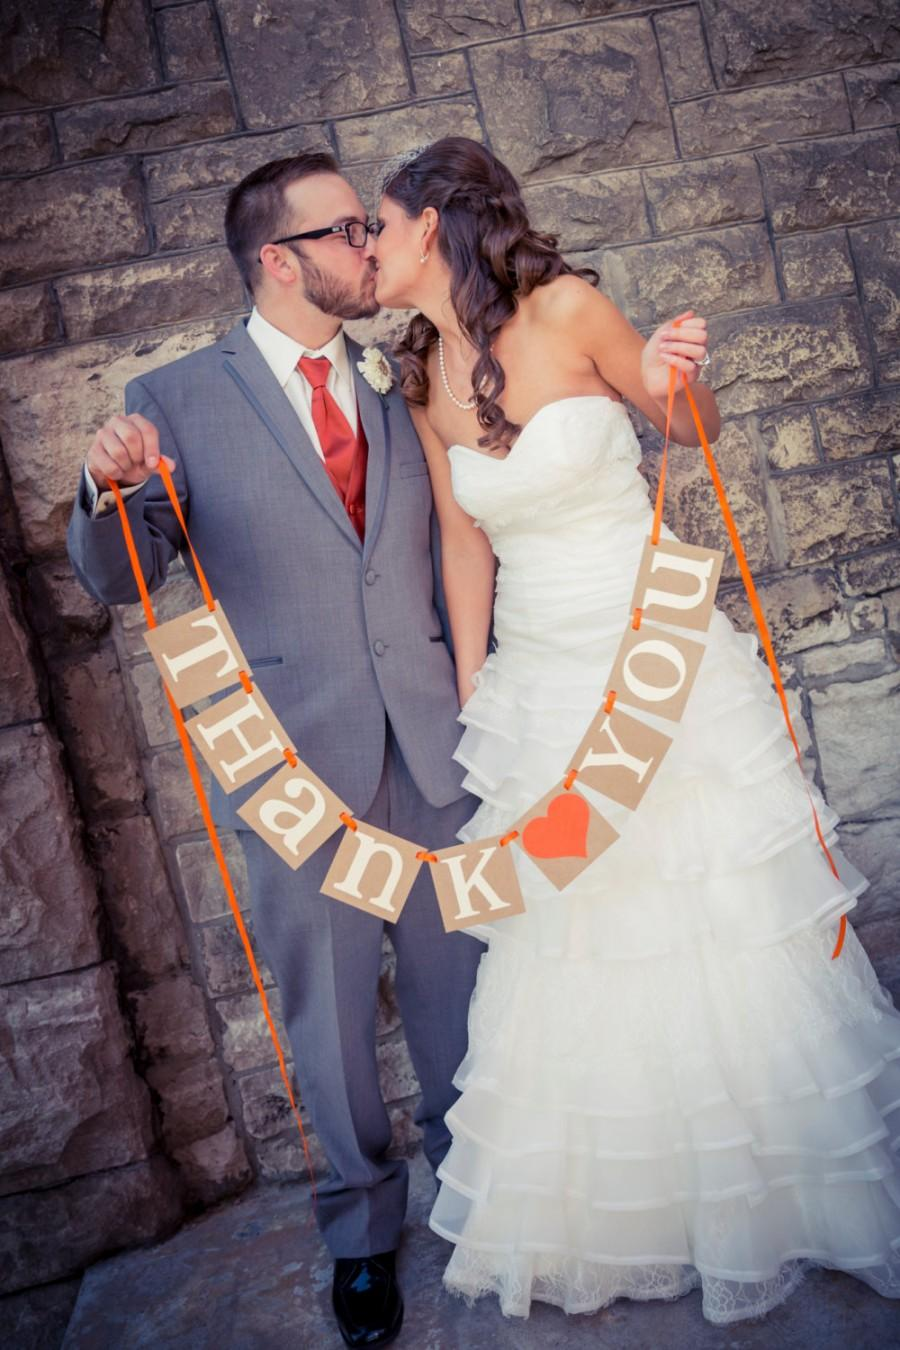 Mariage - Thank You Sign / Rustic Wedding Banner Photo Prop - Wedding Sign - Wedding Decoration